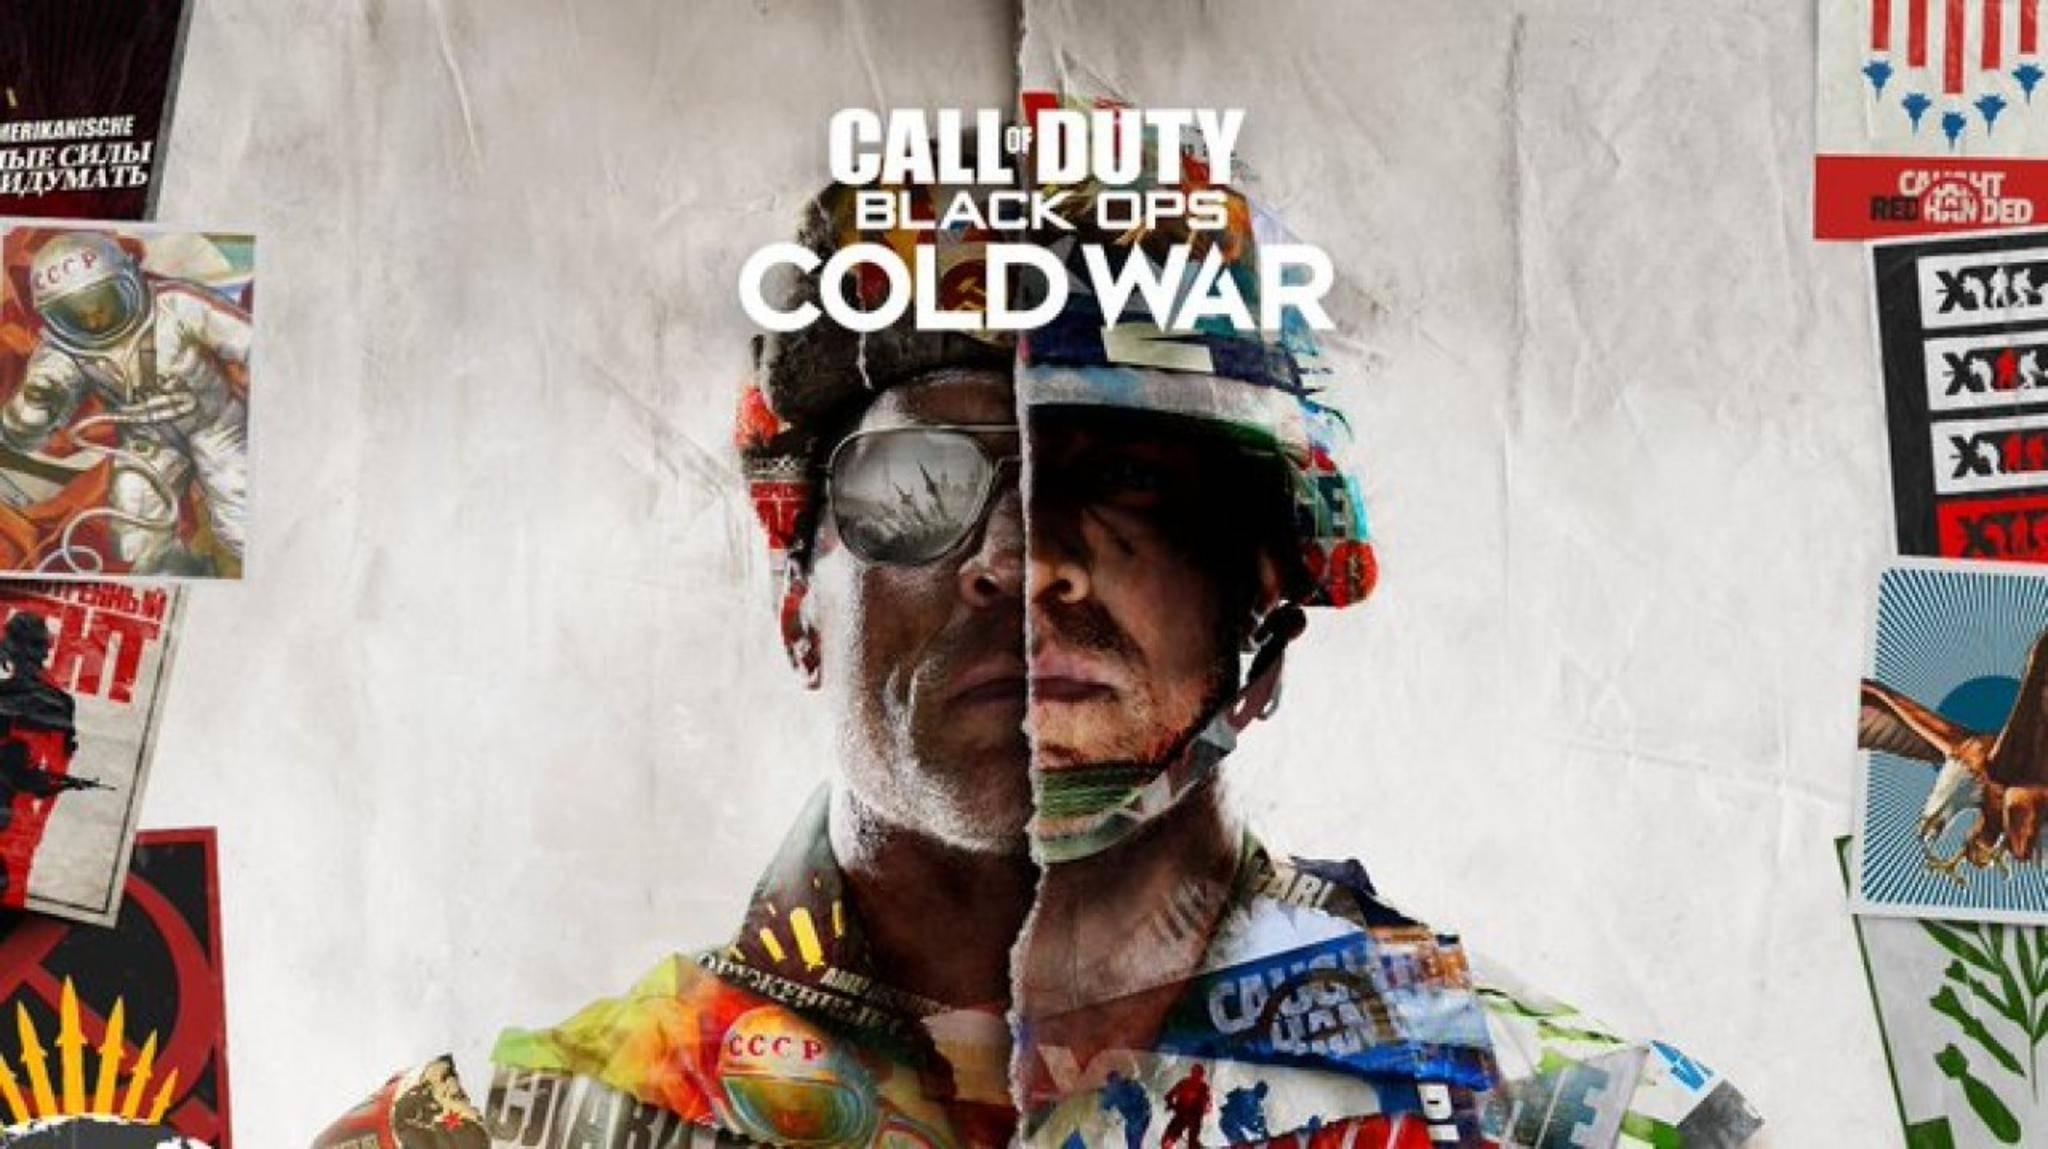 Call-of-Duty-Black-Ops-Cold-War-keyart